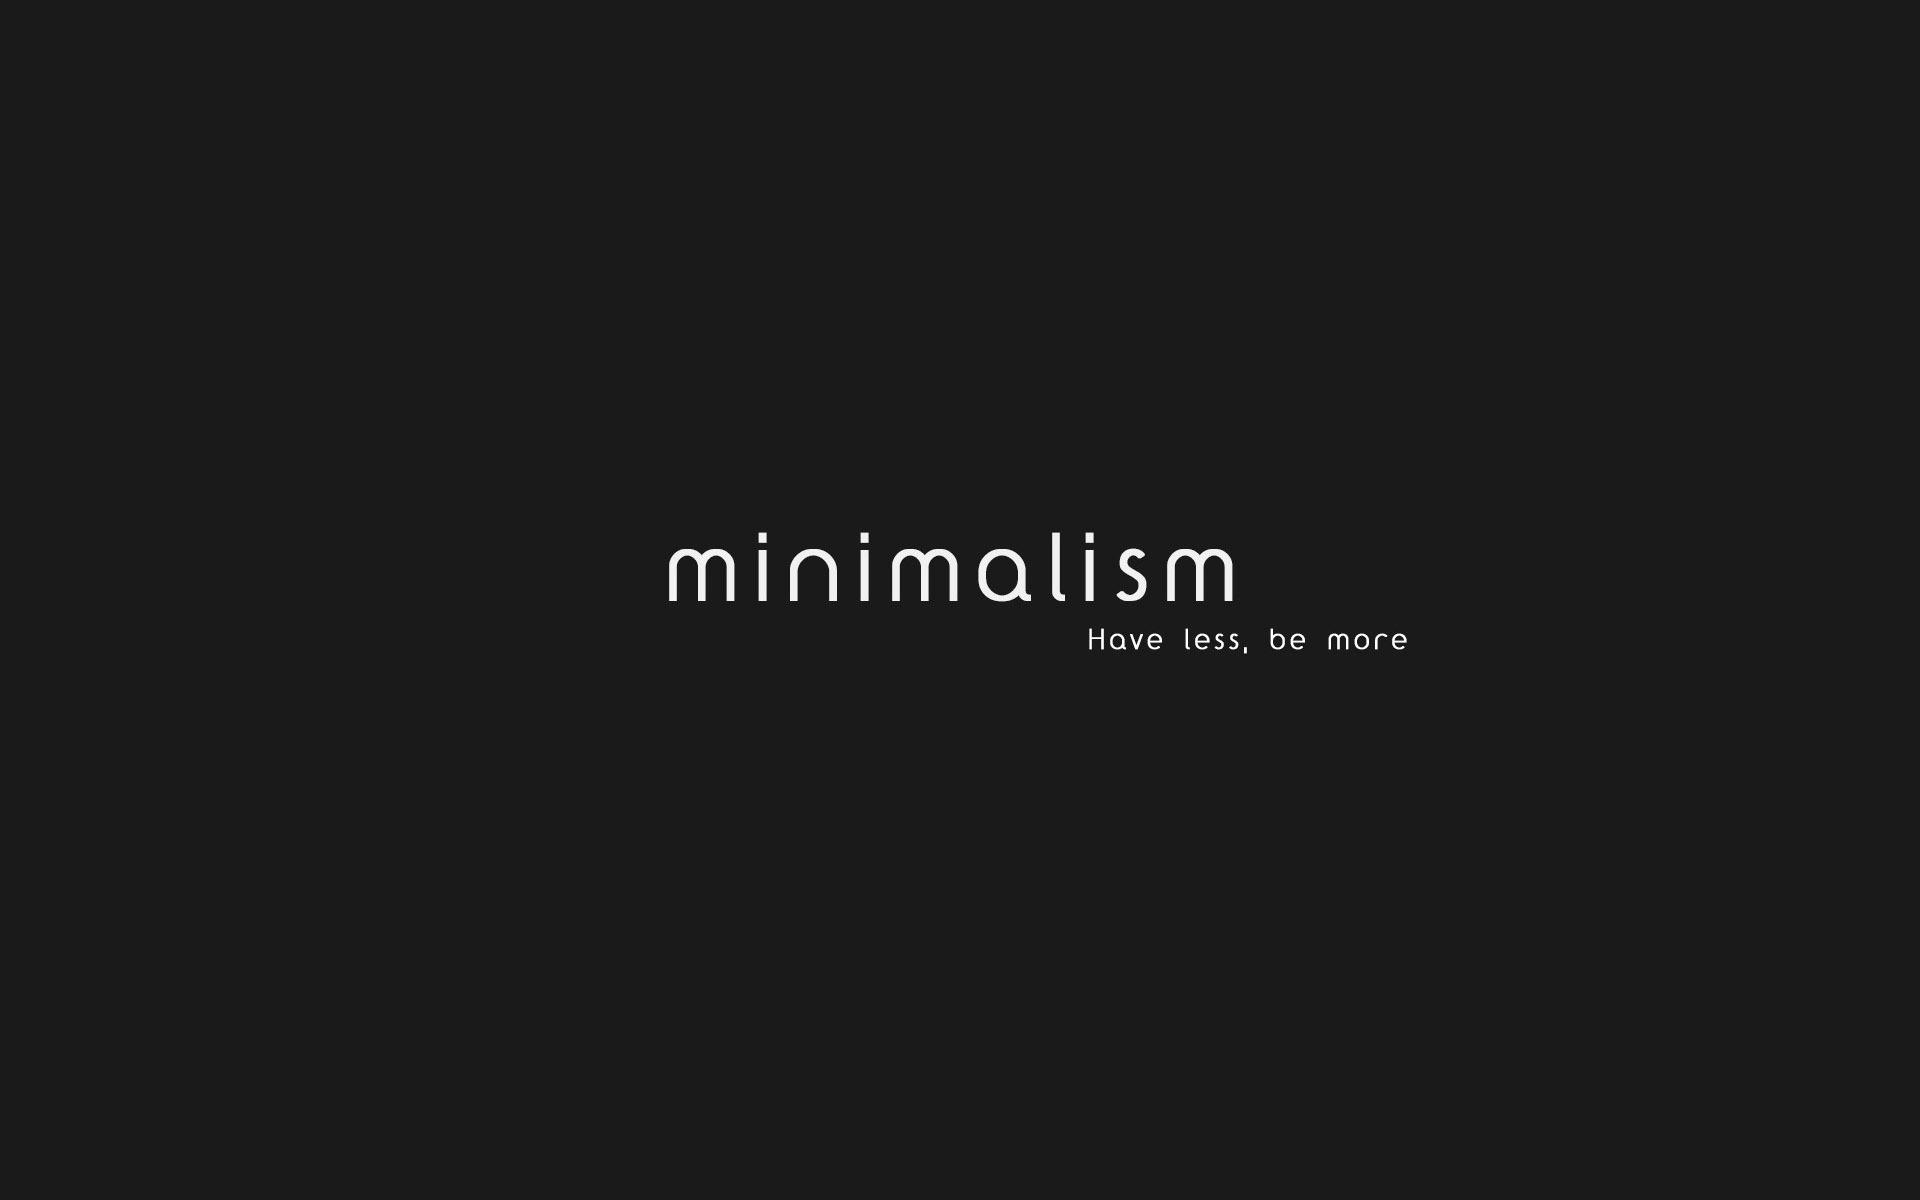 Beautiful Wallpaper Horse Minimalist - minimalism-typography-hd-wallpaper-1920x1200-6093  Picture_16398.jpg